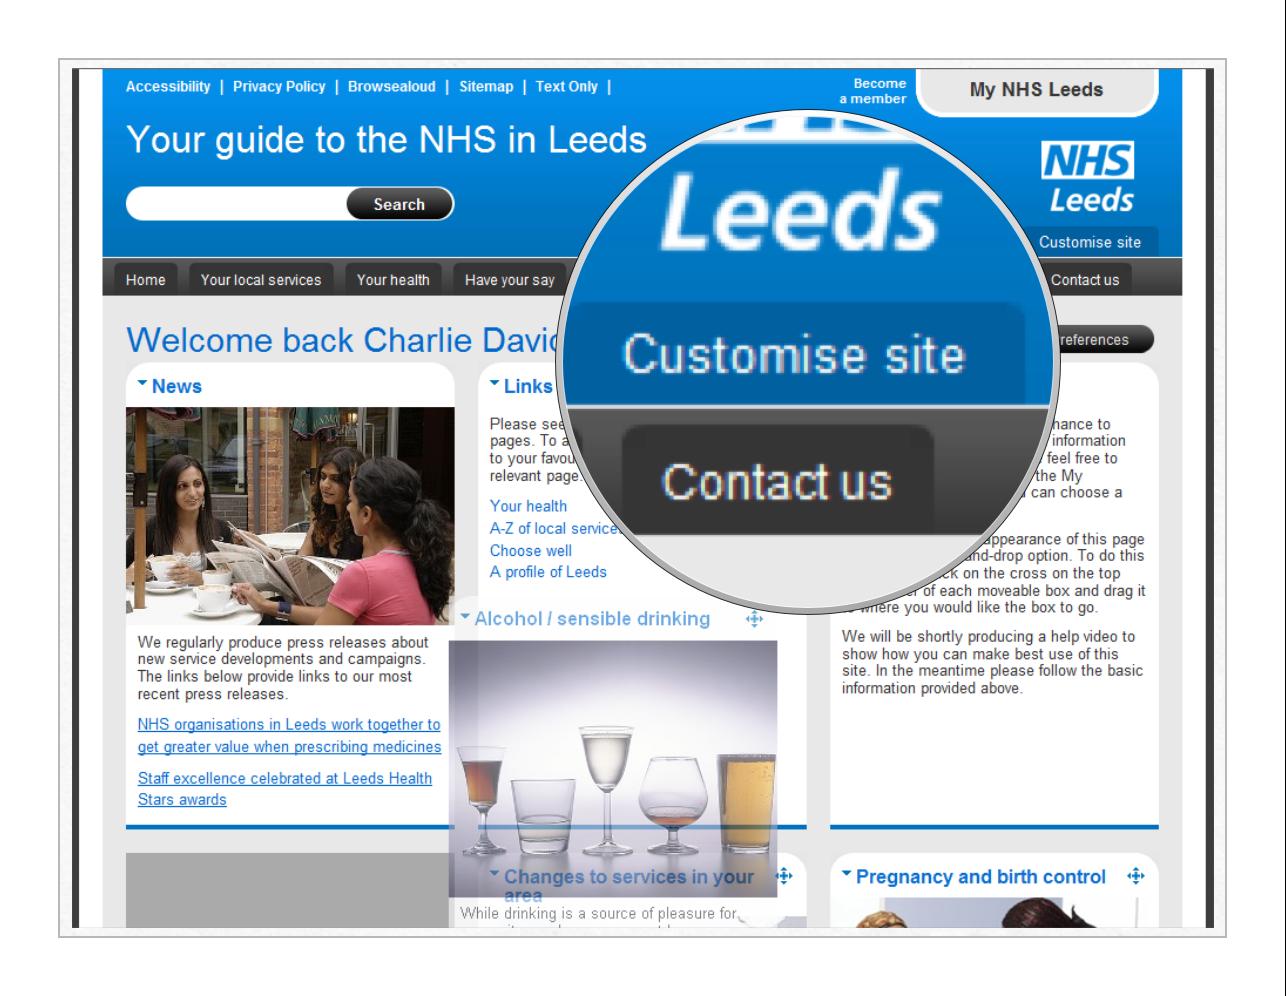 Customisation on the NHS Leeds sites